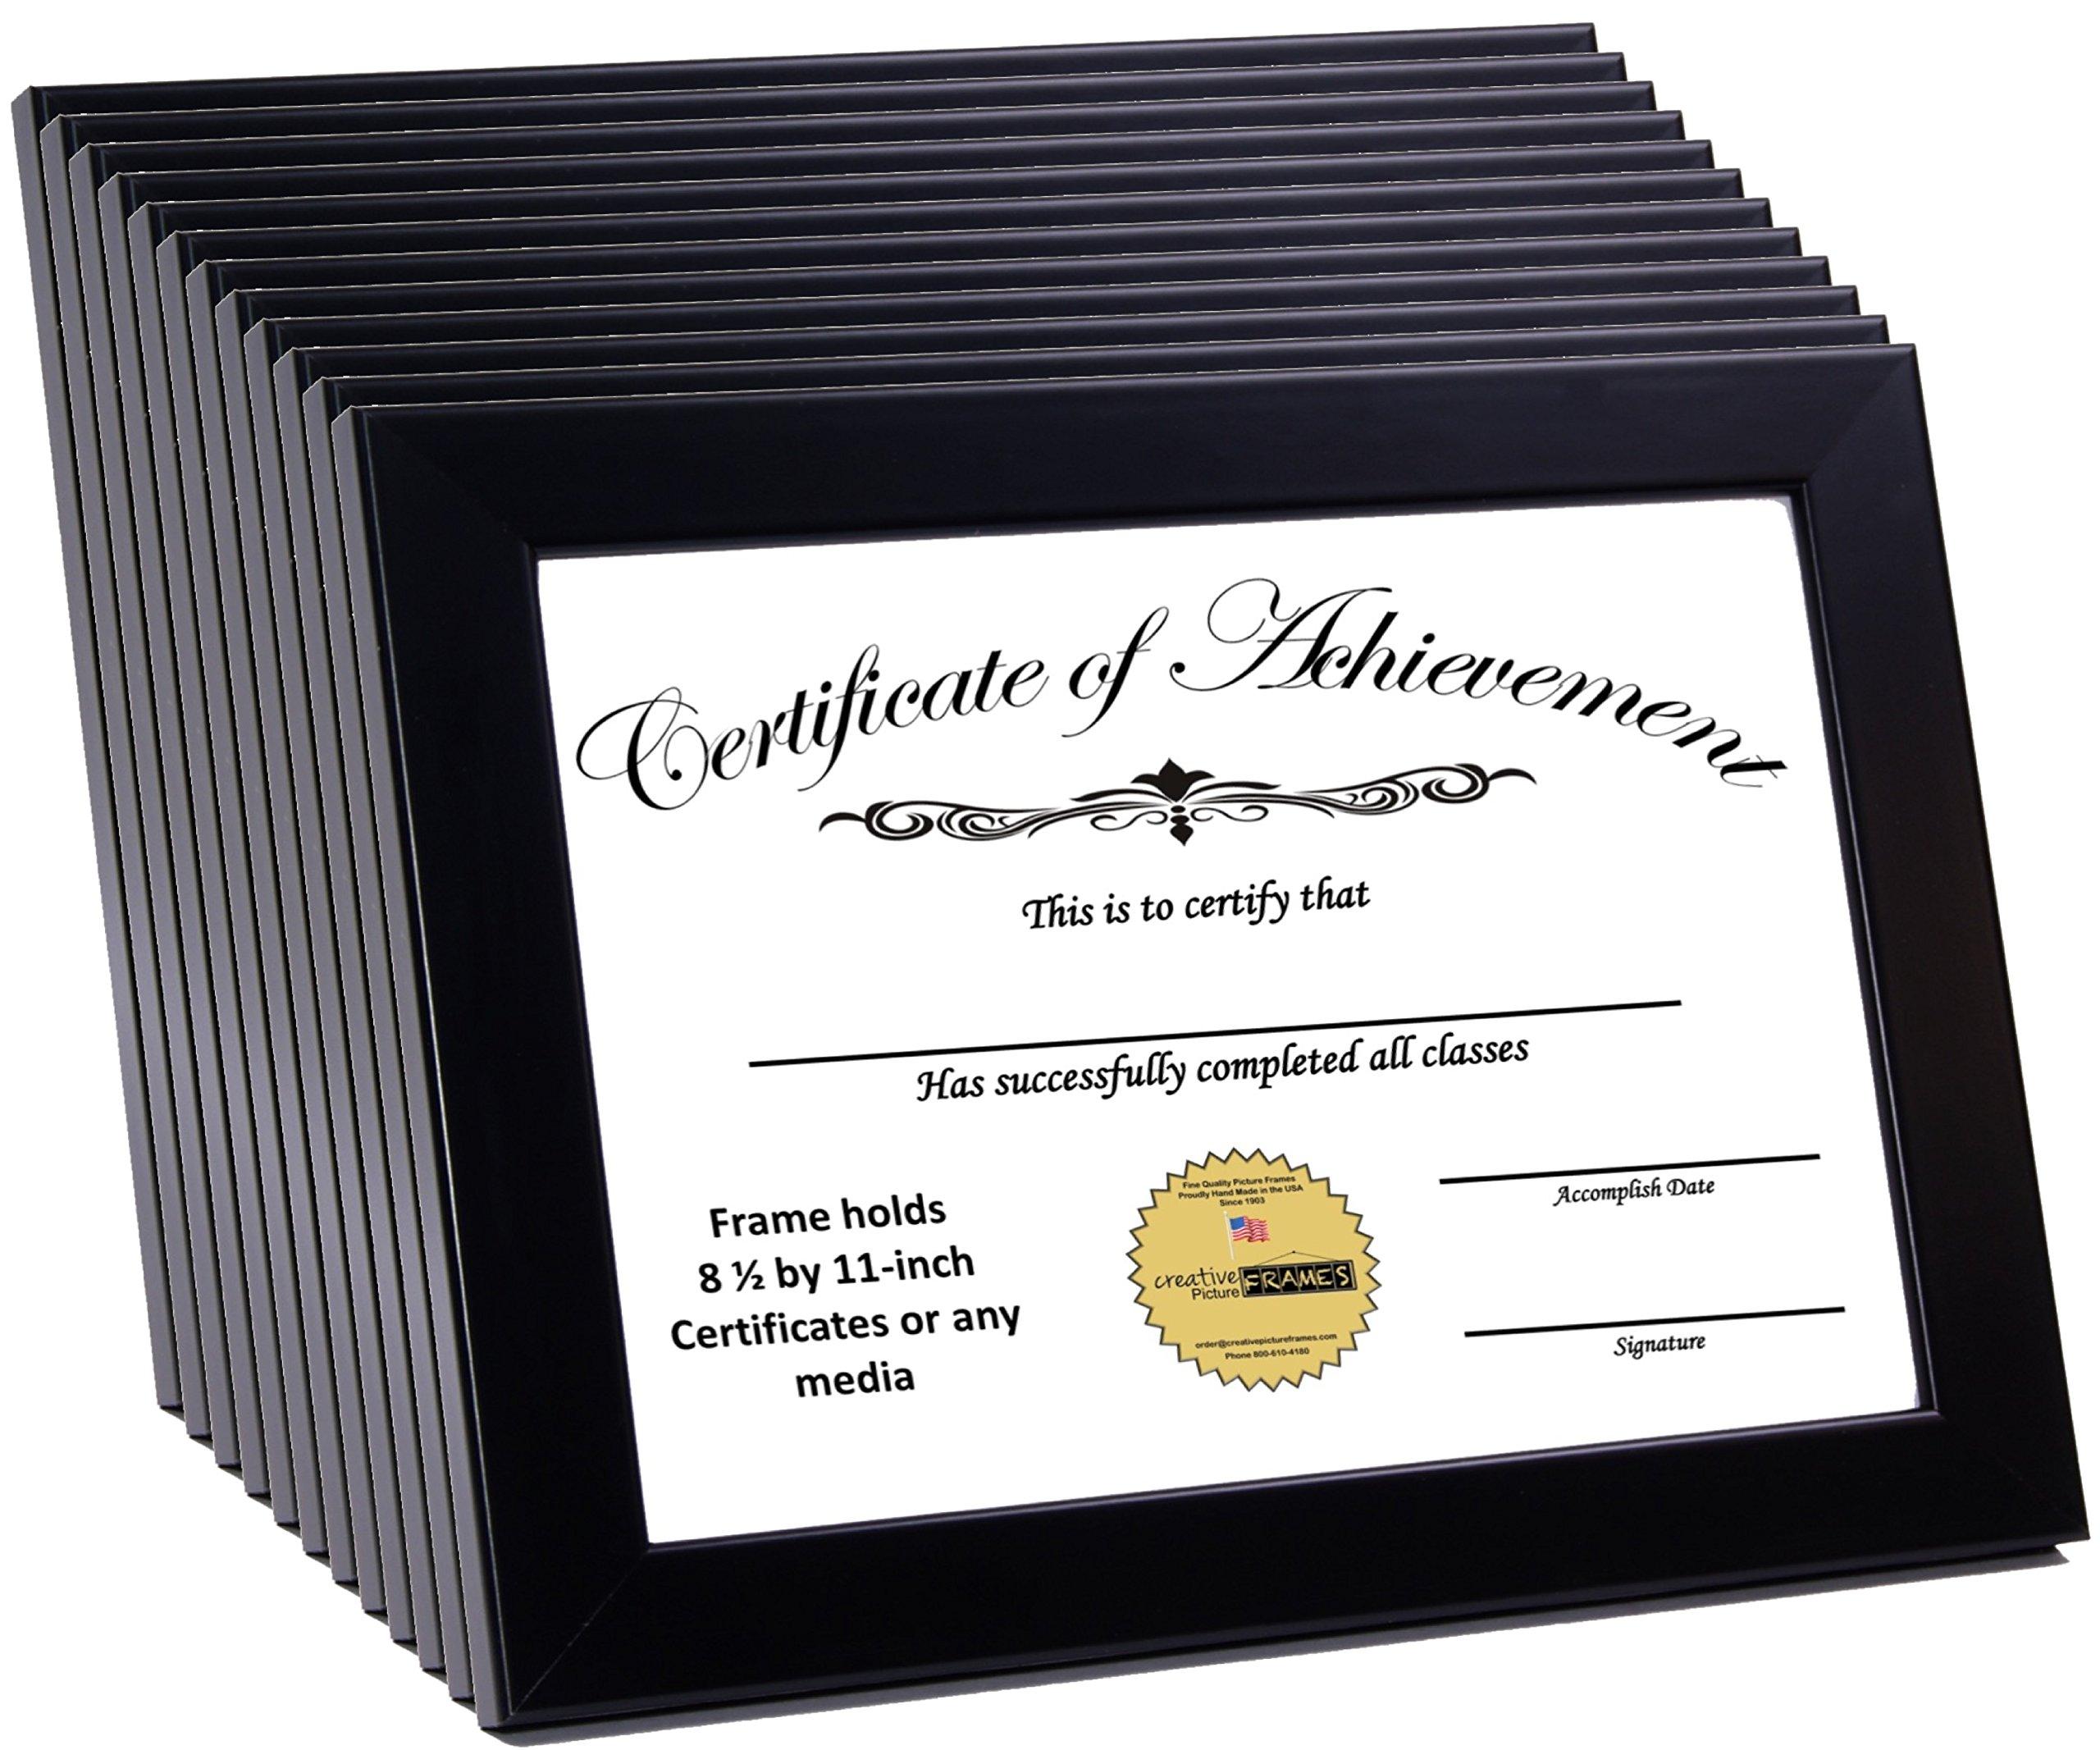 CreativePF [8.5x11bk] Black Document Frame Displays 8.5 by 11-inch Certificate, Graduation, University, Diploma Frames